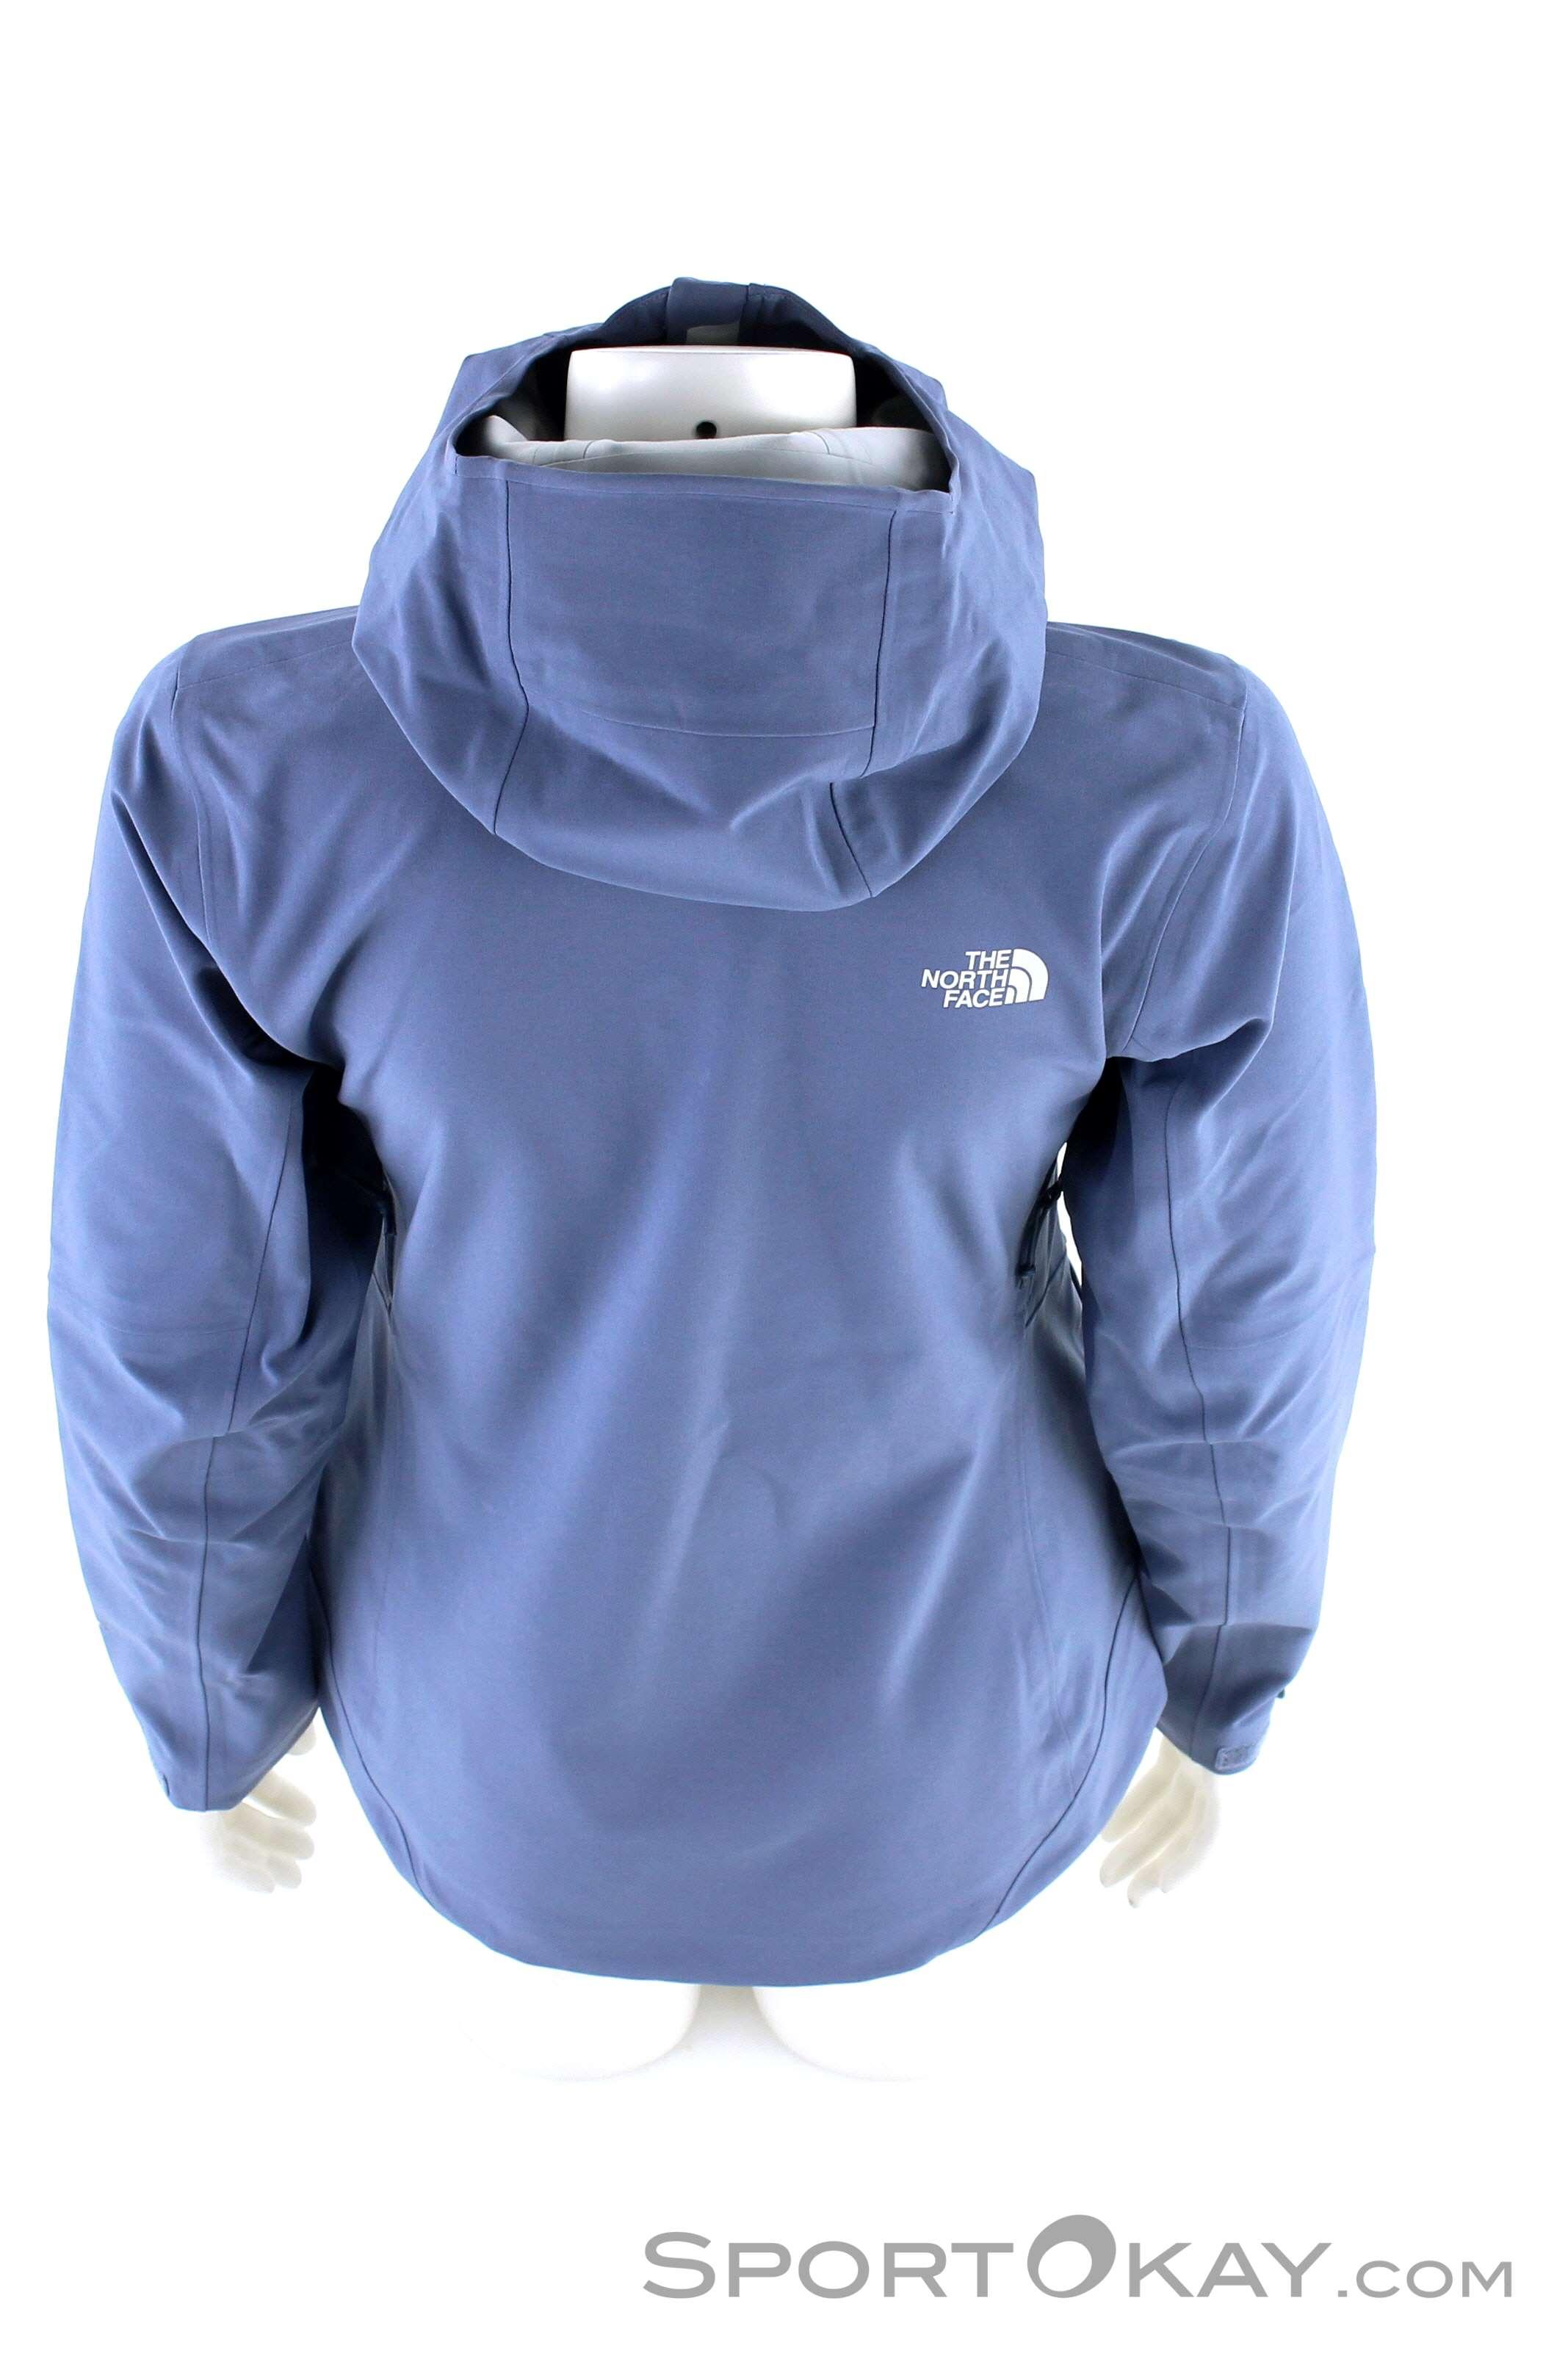 Outdoor The Womens Jacket Dryvent North Face Flex Apex b76gvYfy